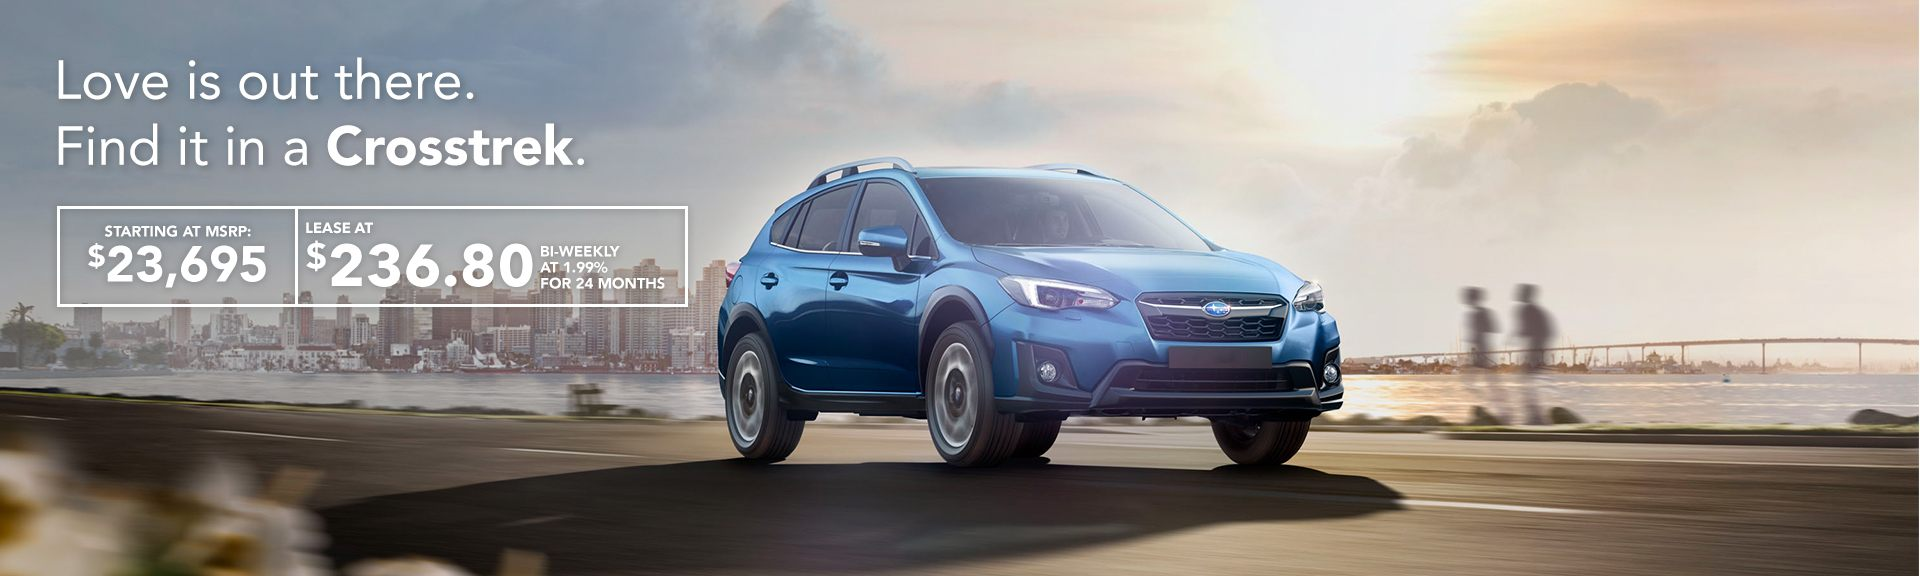 2019 Subaru Crosstreck